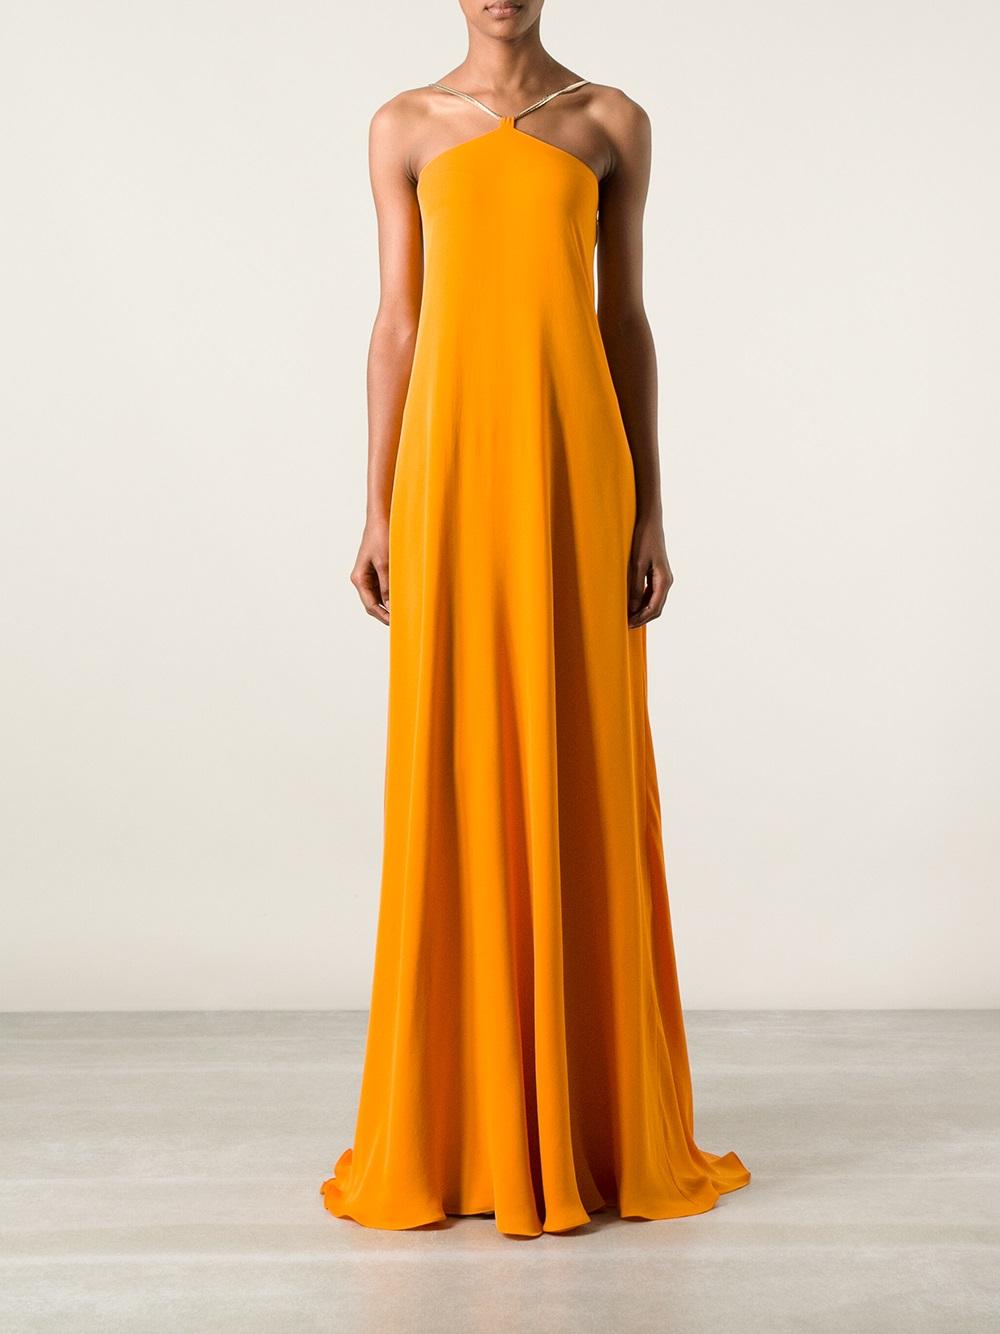 Lyst - Plein Sud Backless Evening Gown in Orange